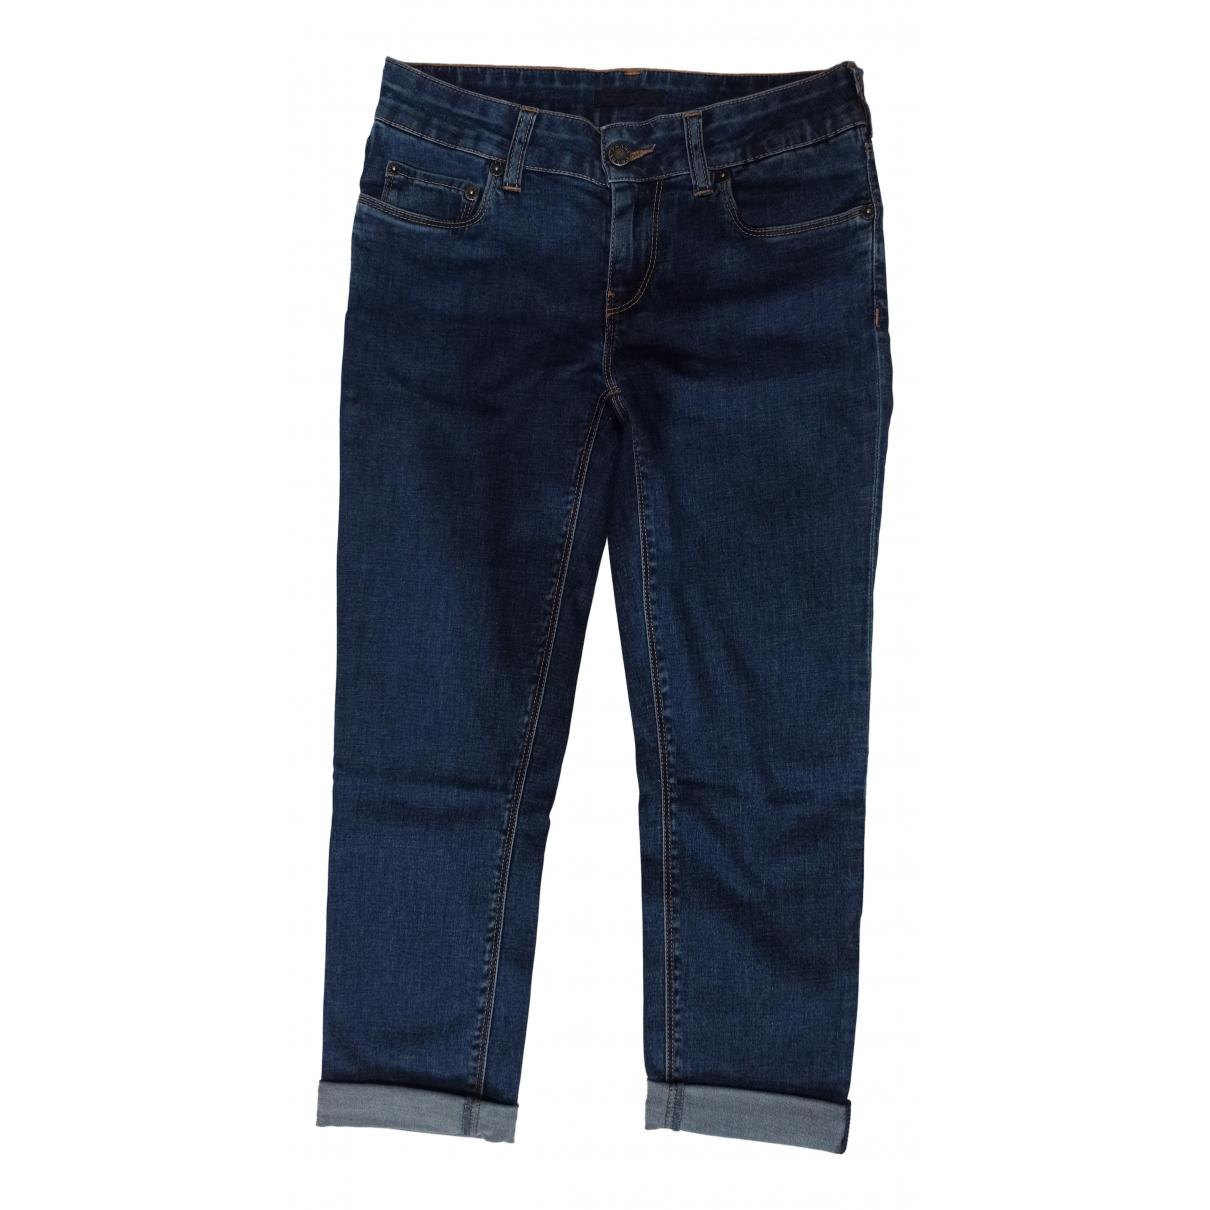 Prada N Blue Cotton - elasthane Jeans for Women 26 US